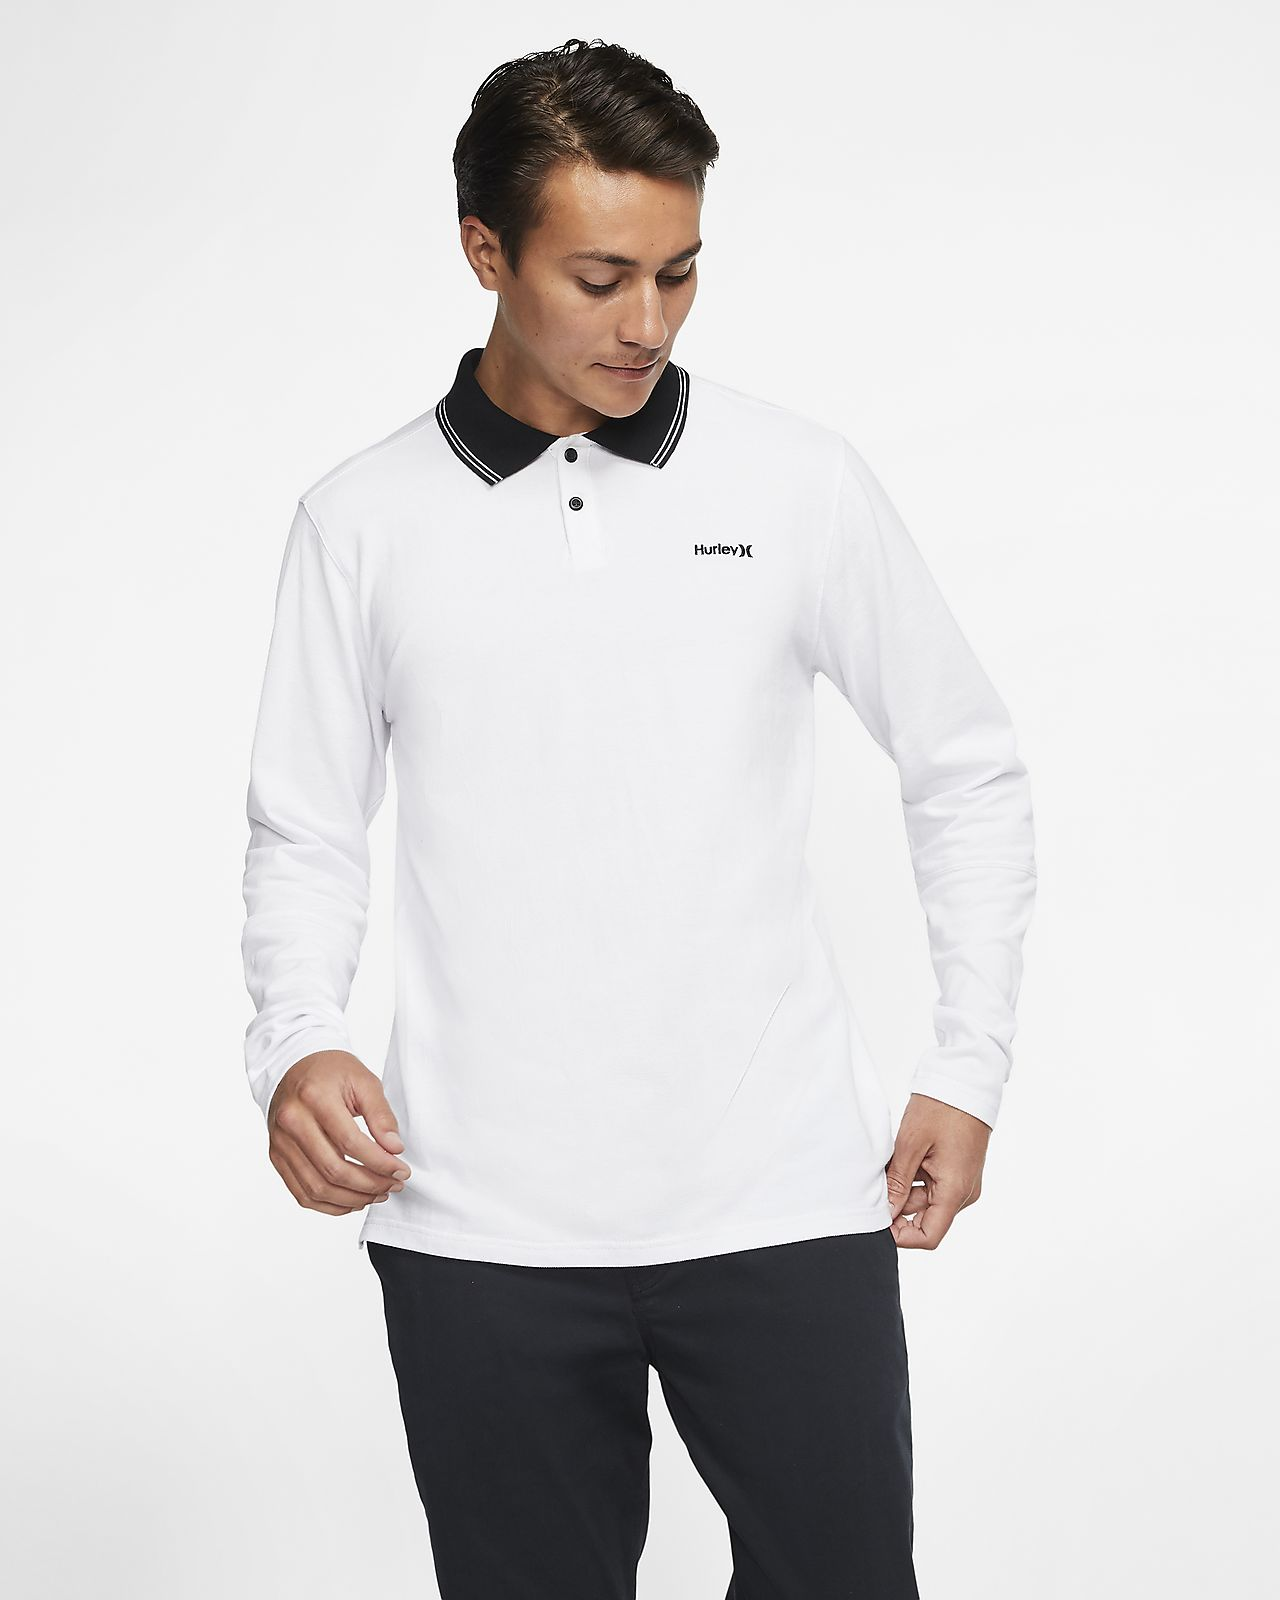 Hurley 2 Stripe Langarm-Poloshirt für Herren